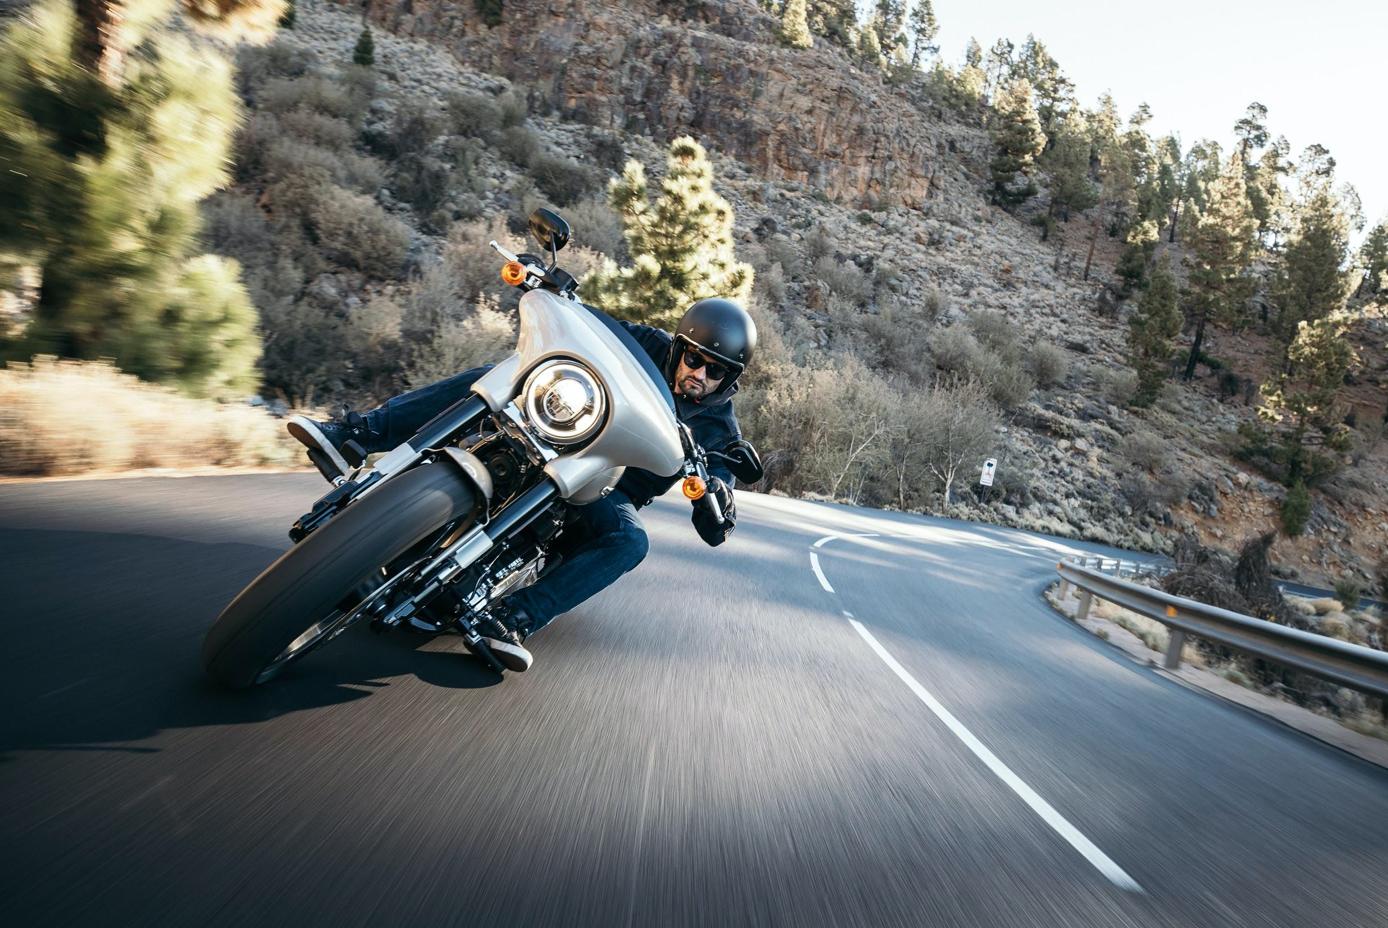 Man taking curve on a motorcycle; image by Harley-Davidson, via Unsplash.com.